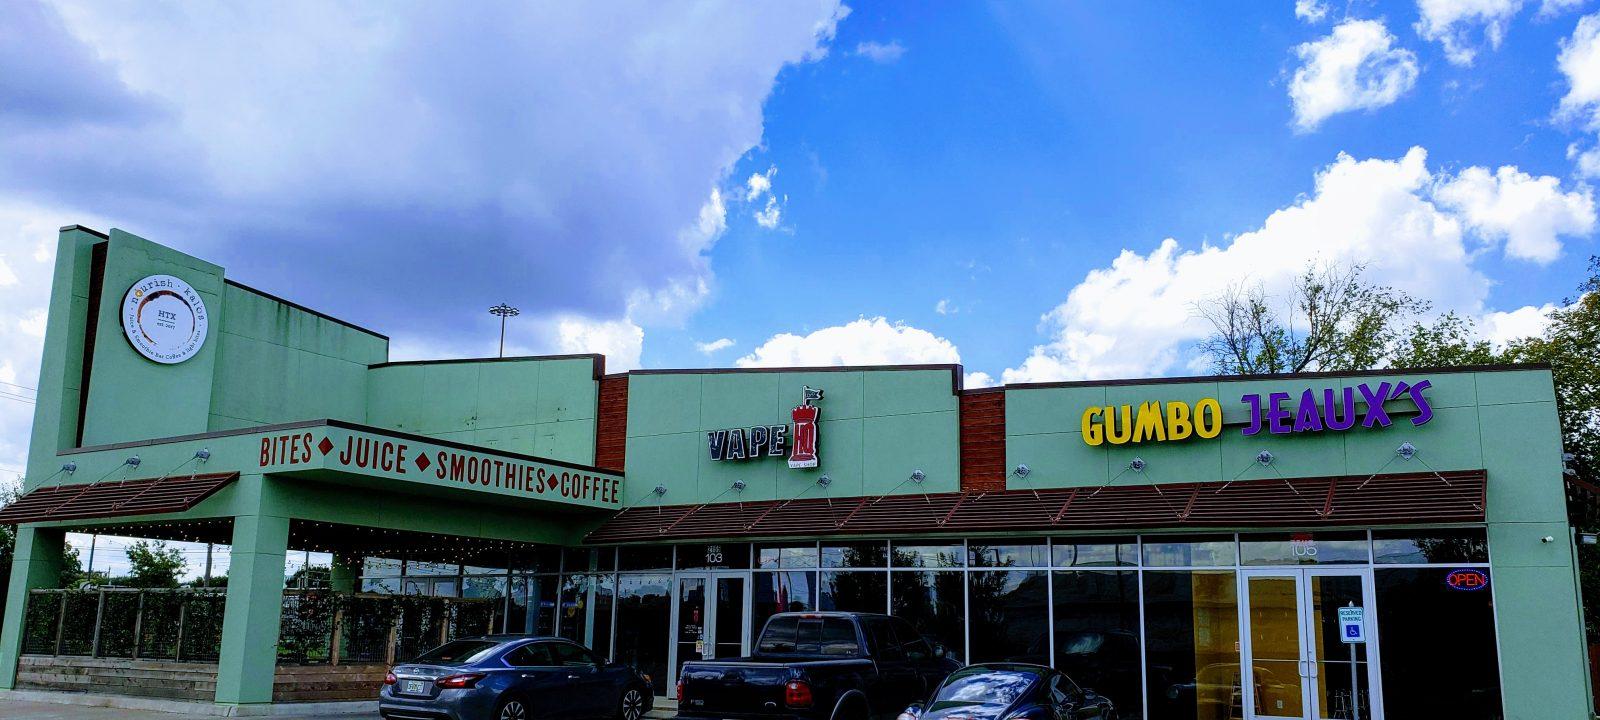 Durham Shopping Center